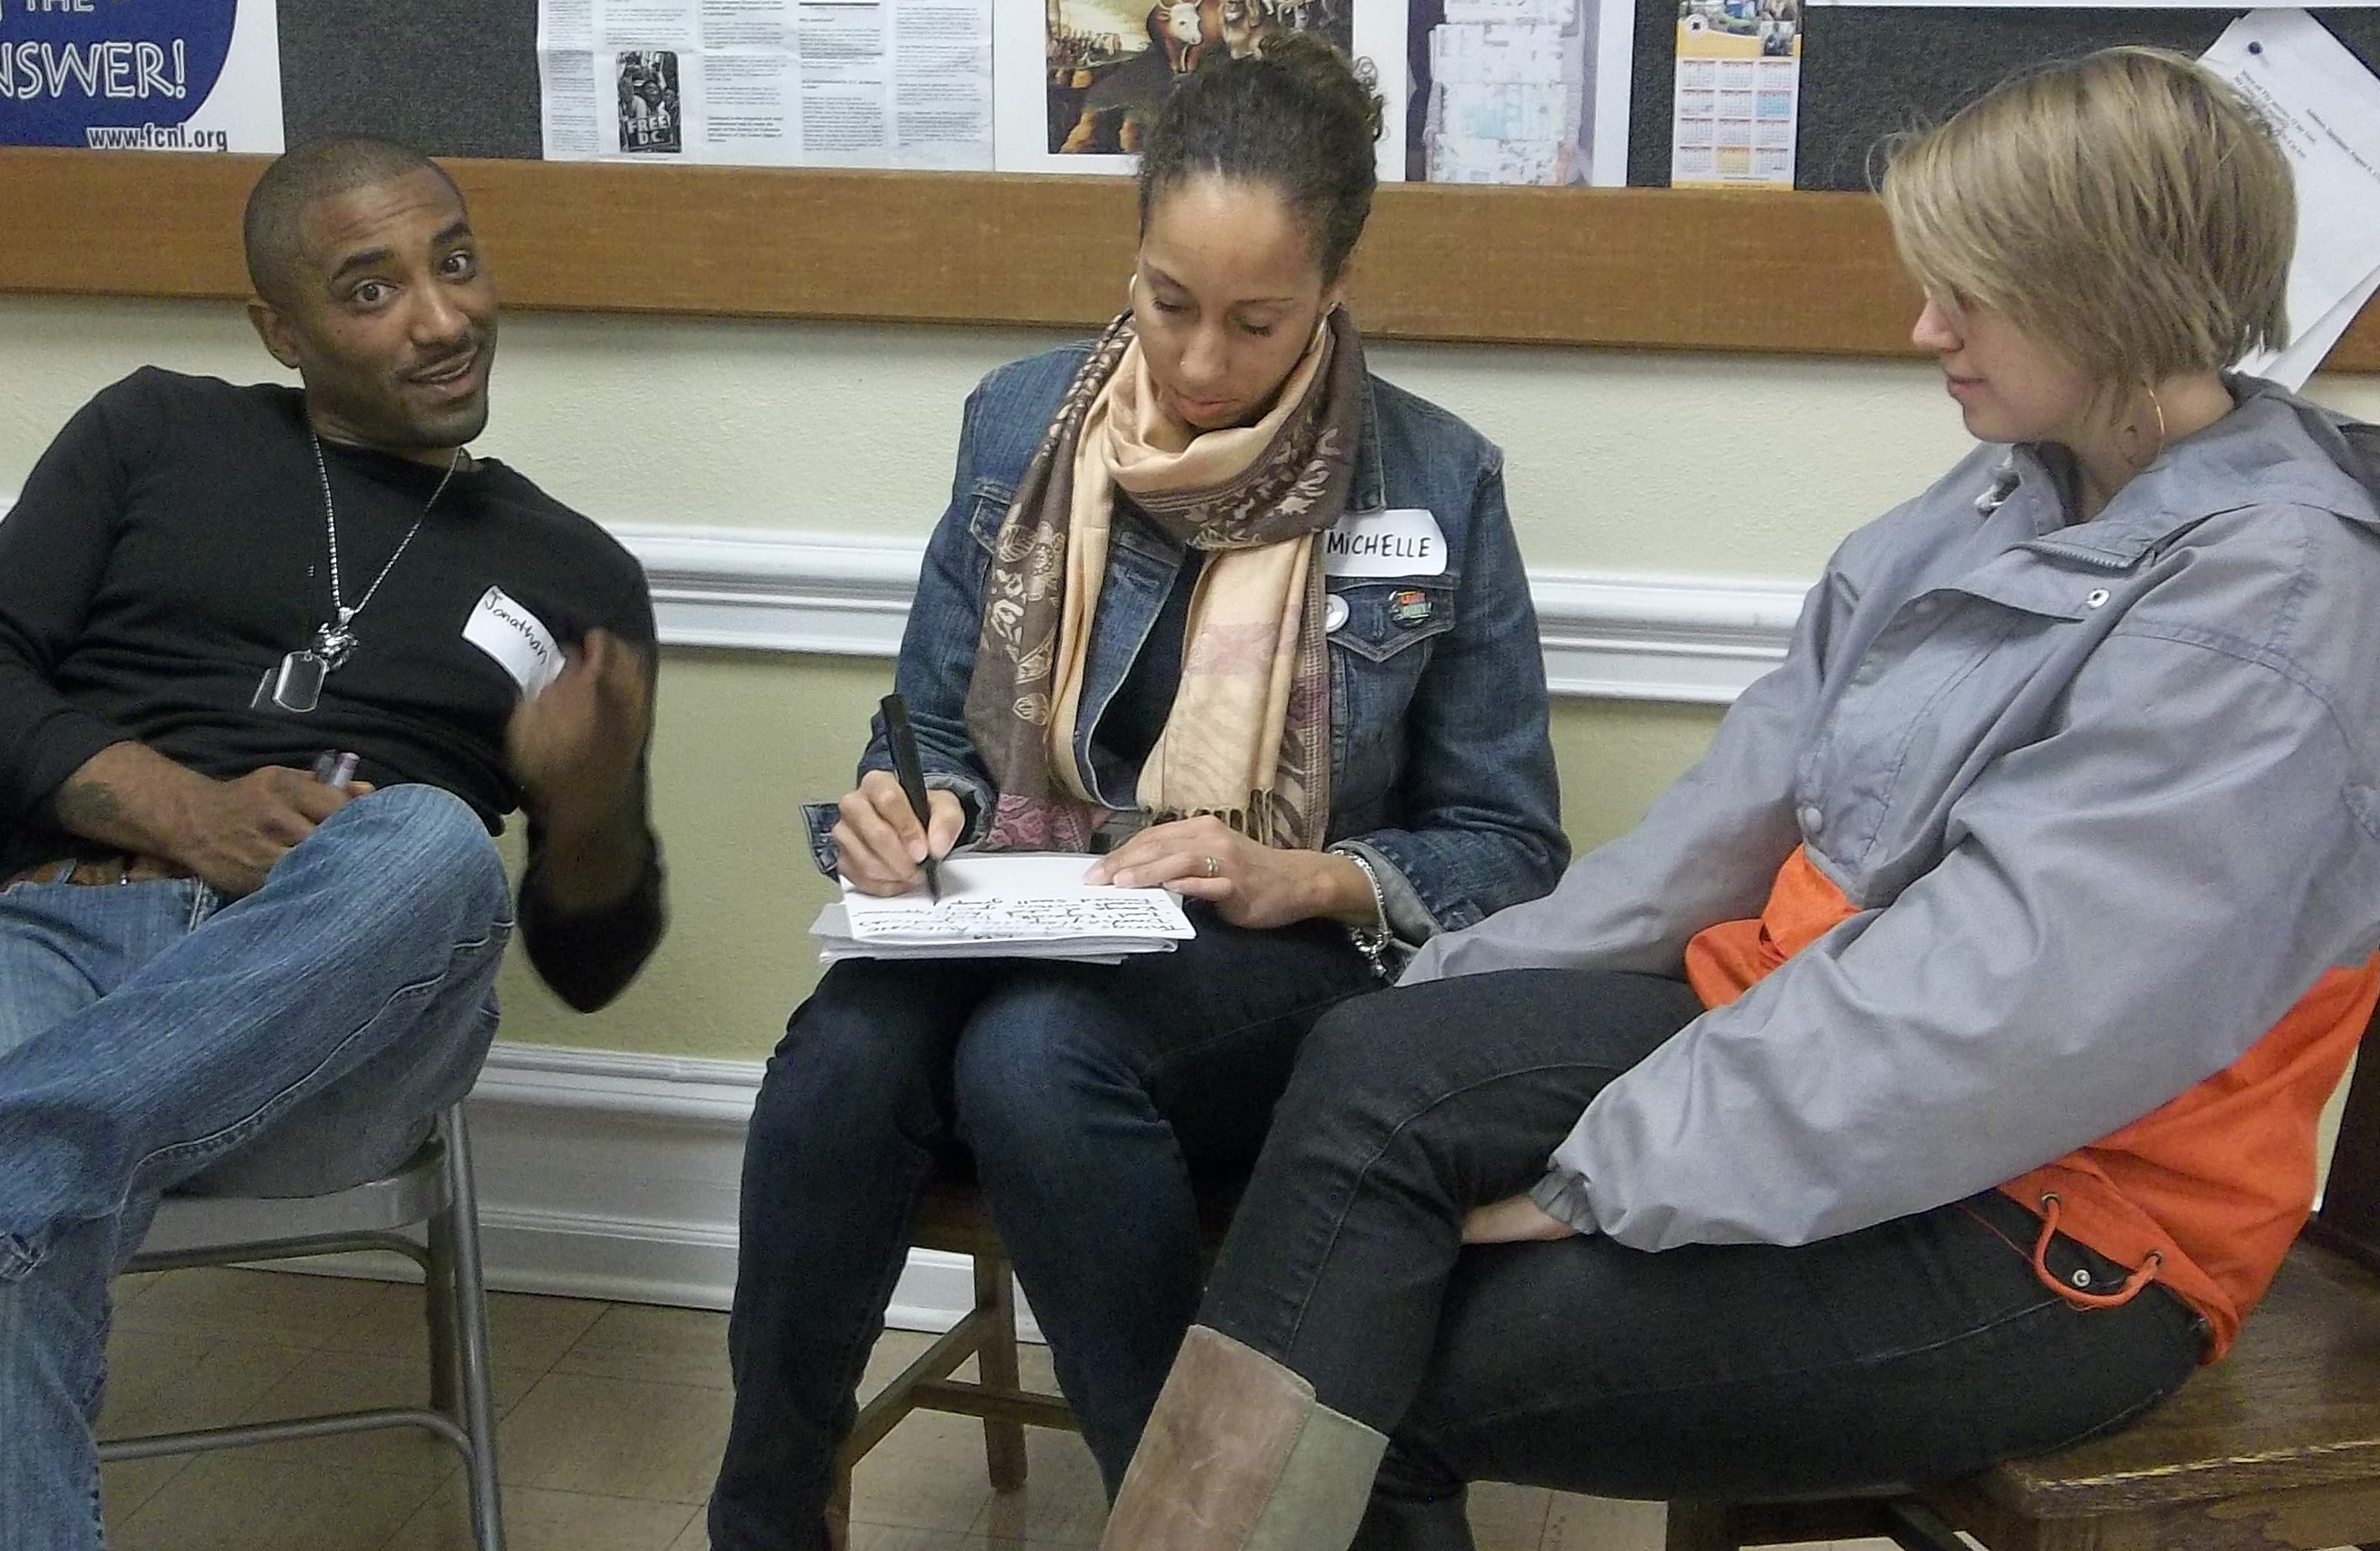 participants discuss the power of language